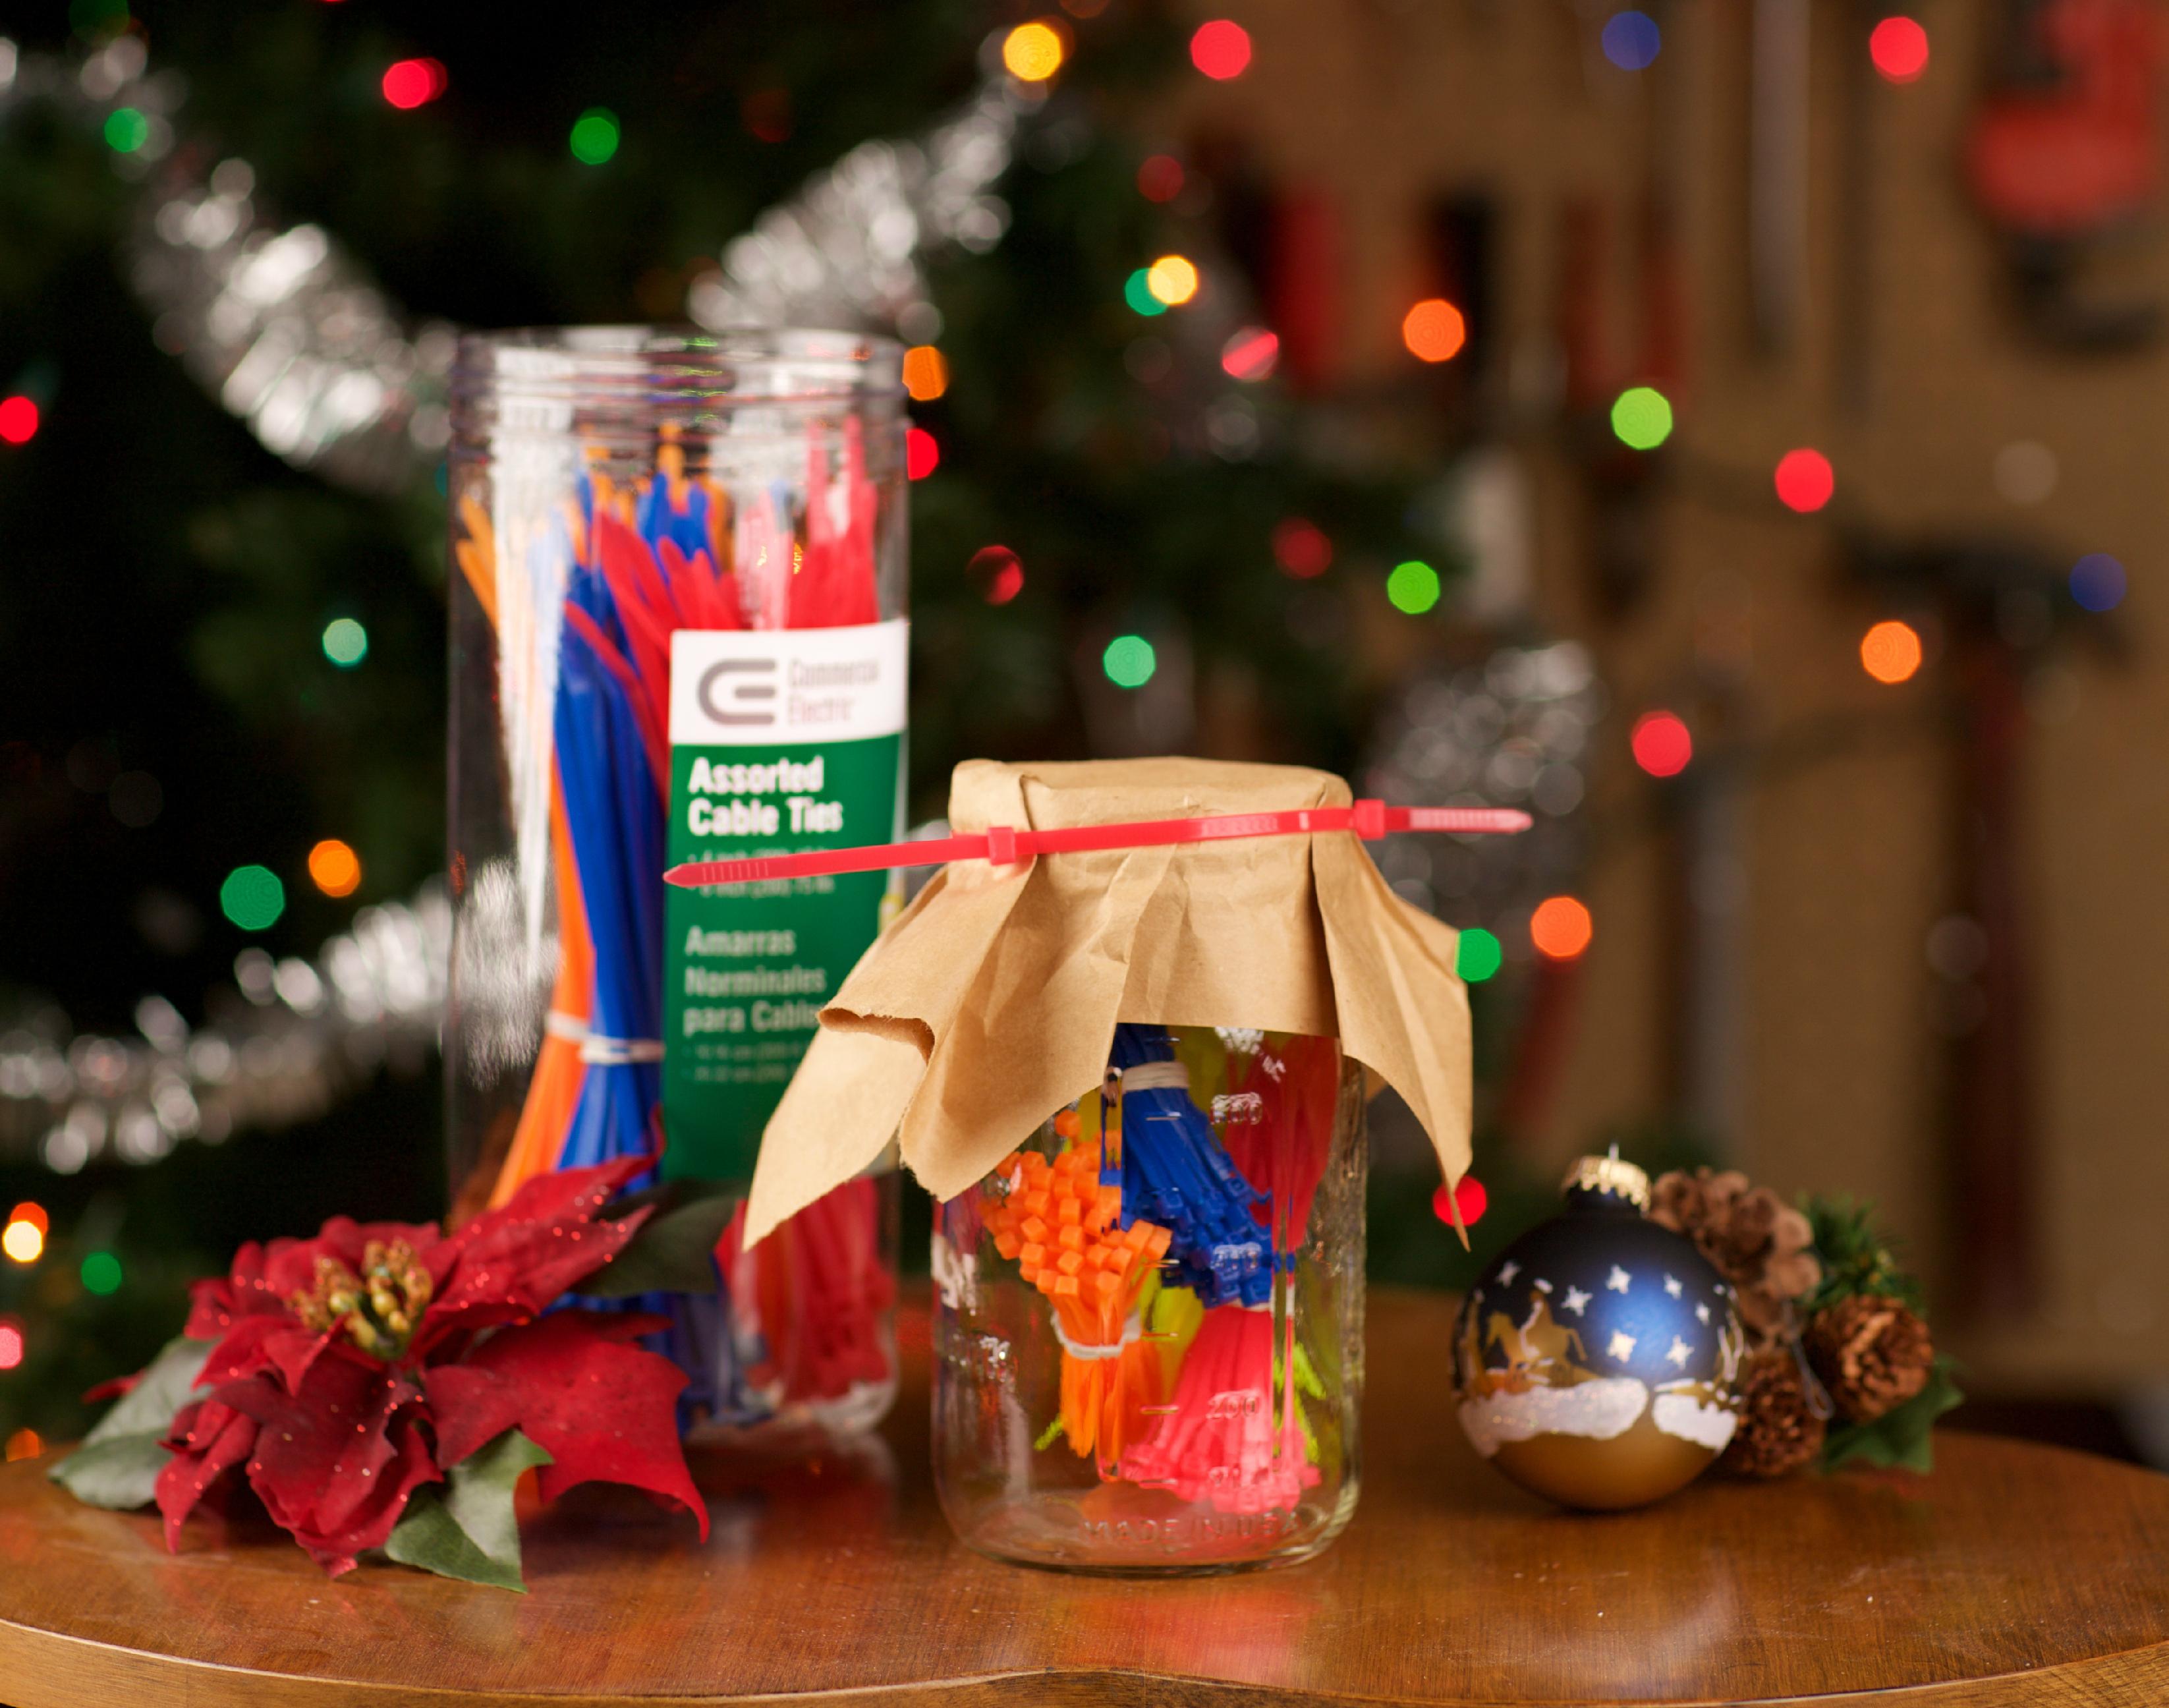 Mason Jar Gifts for Guys   Muddled Ramblings and Half-Baked Ideas